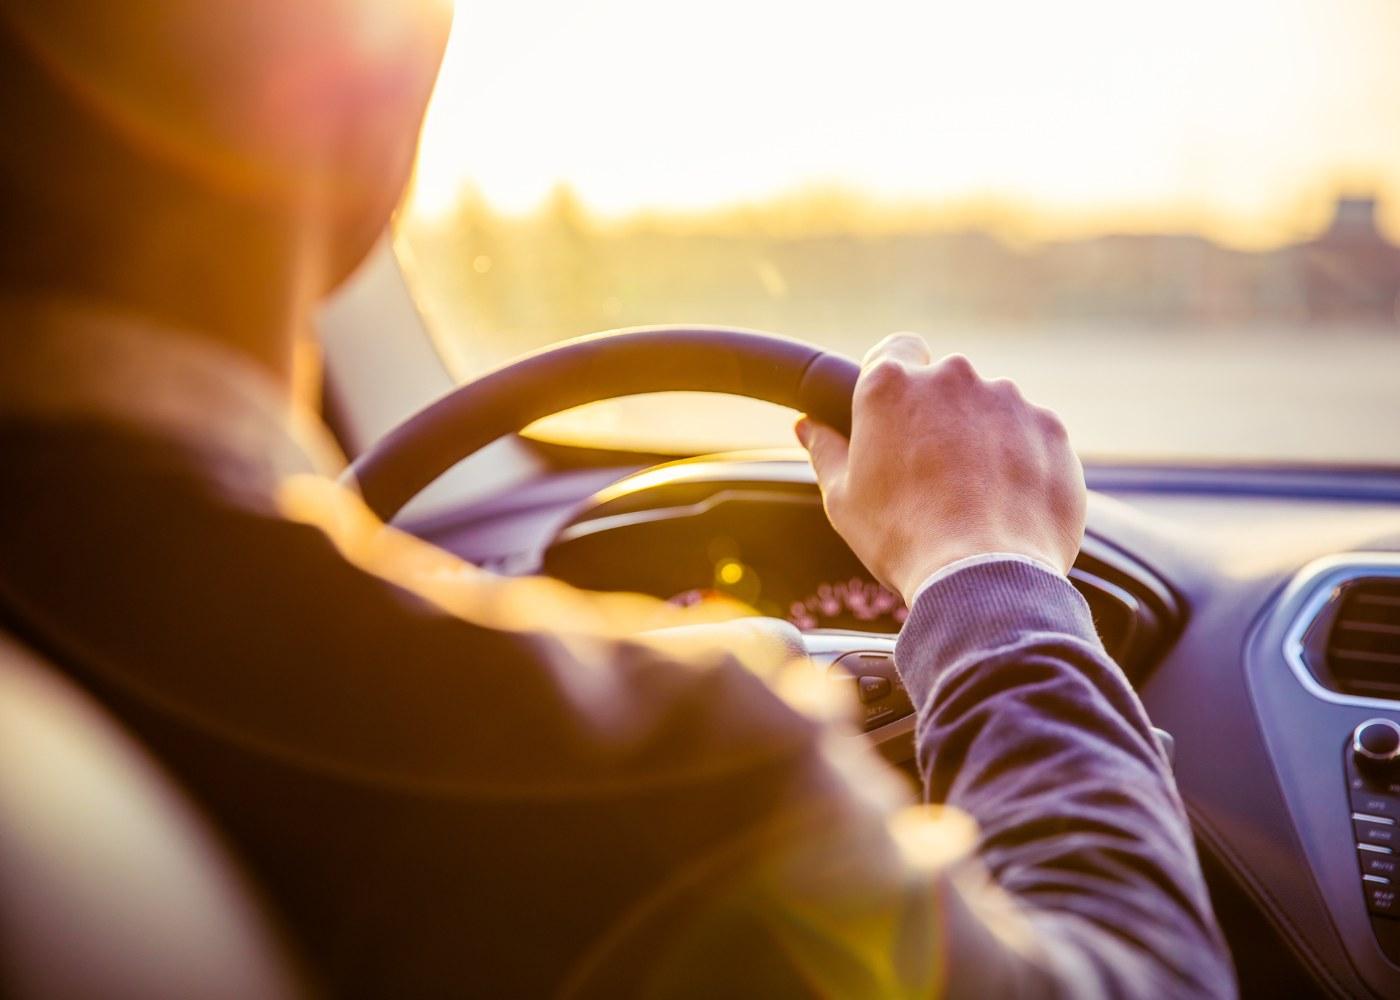 homem a conduzir carro a representar jovens condutores